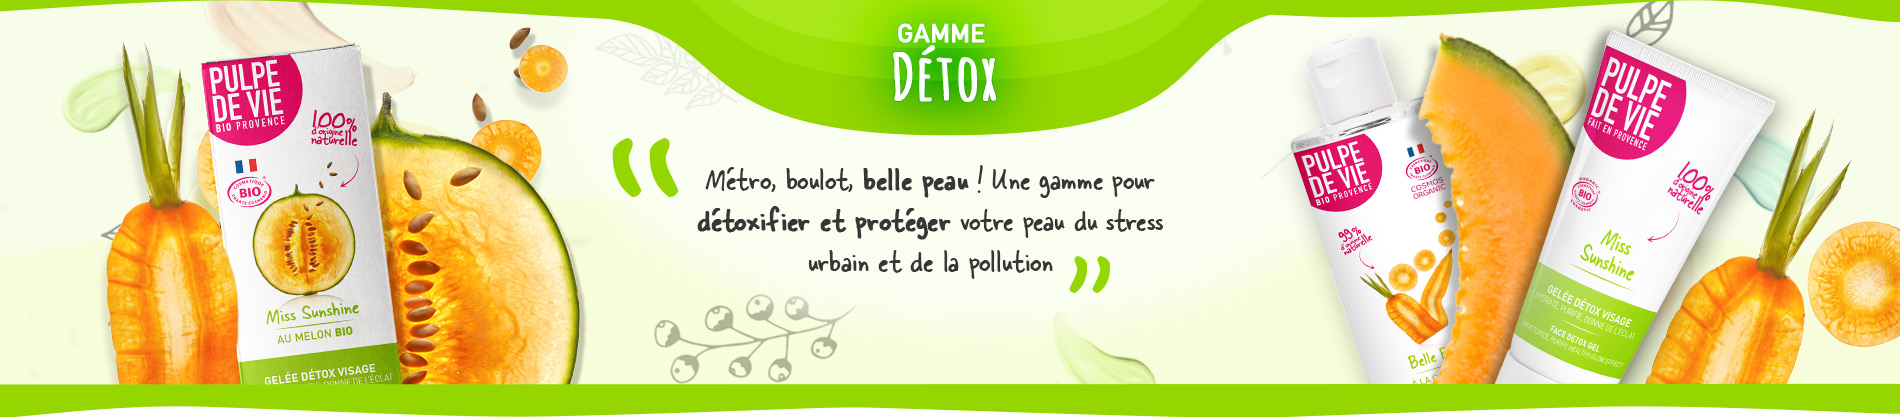 Gamme Détox